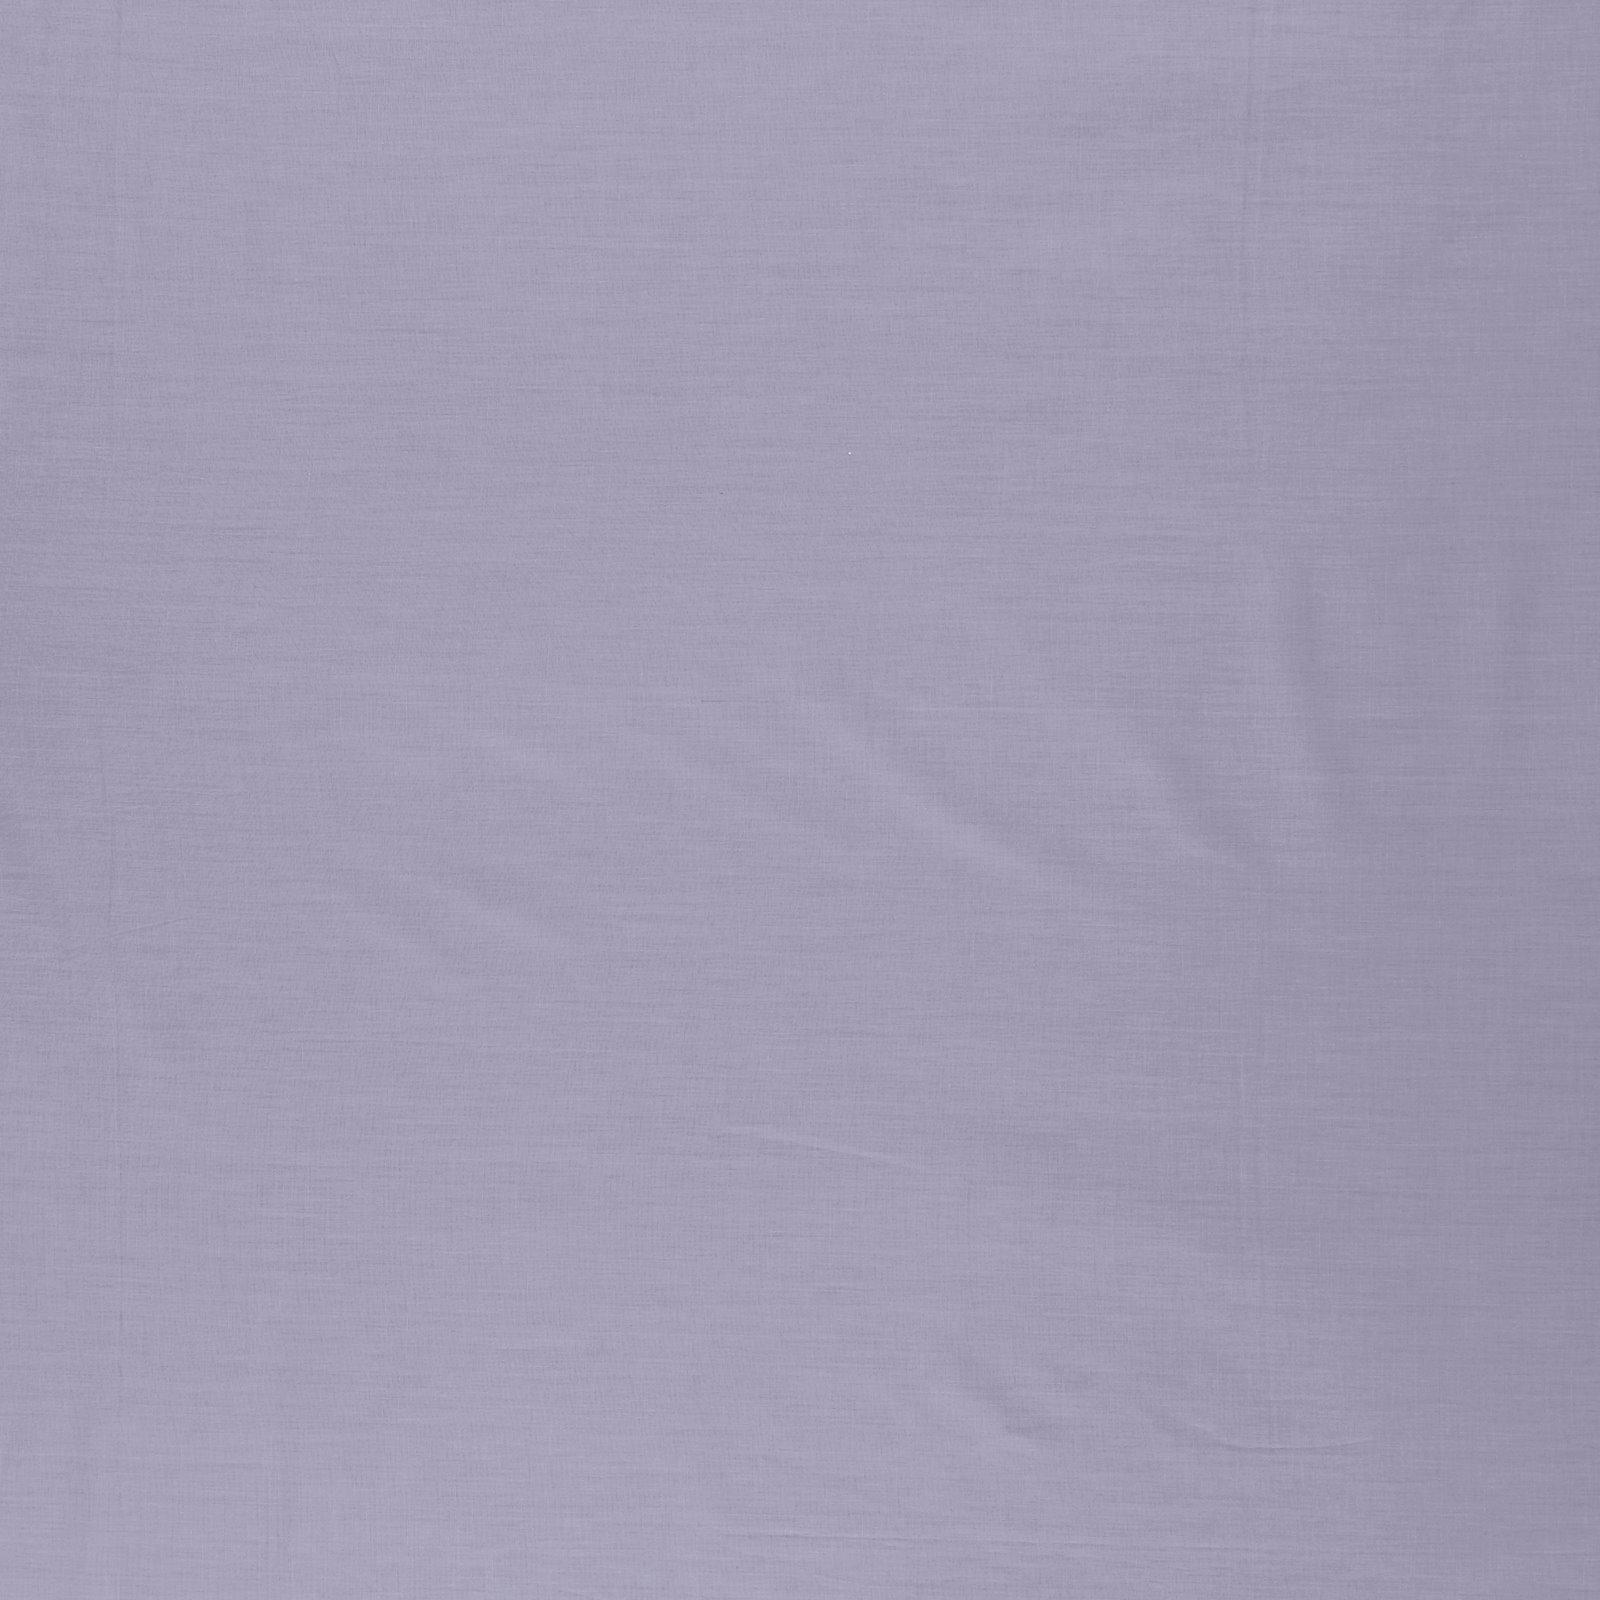 Cotton poplin light blue 501576_pack_sp